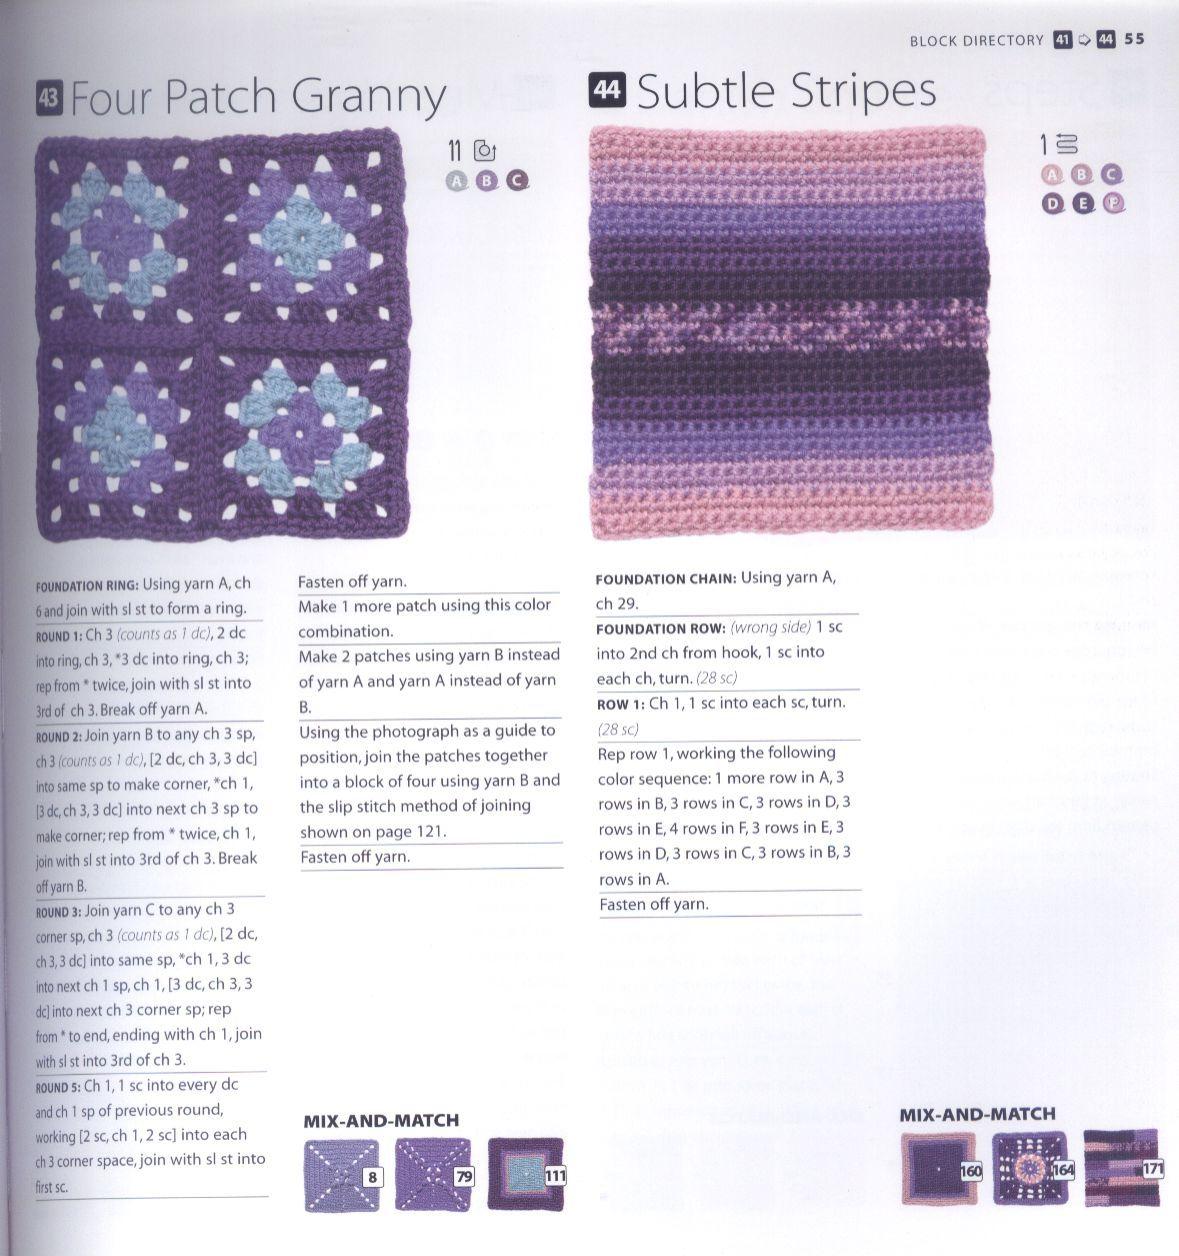 200 Crocheted Blocks for blankets, throws & Afghans 055